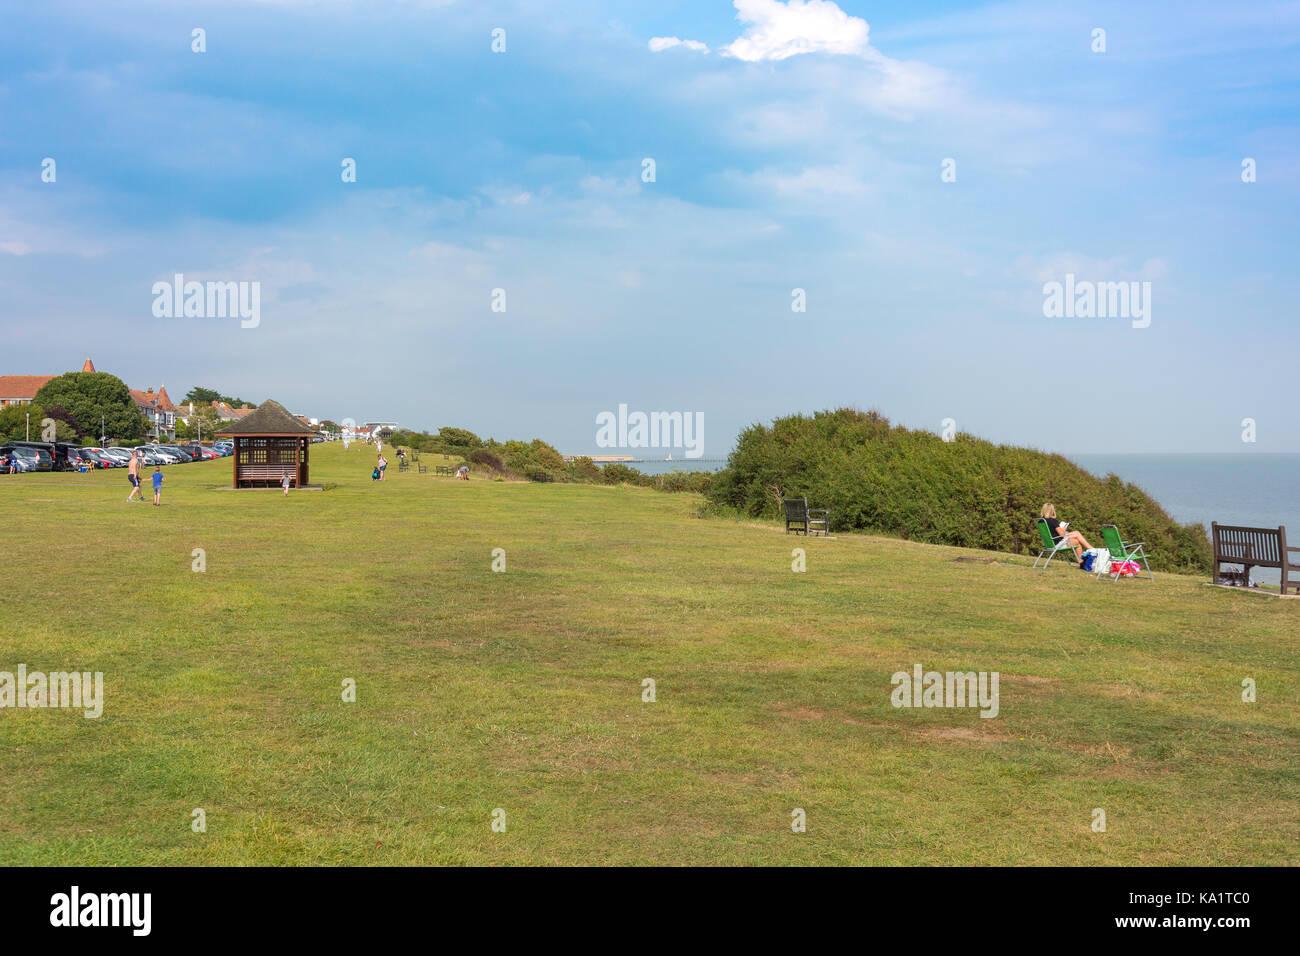 Greensward, The Esplanade, Frinton-on-Sea, Essex, England, United Kingdom - Stock Image